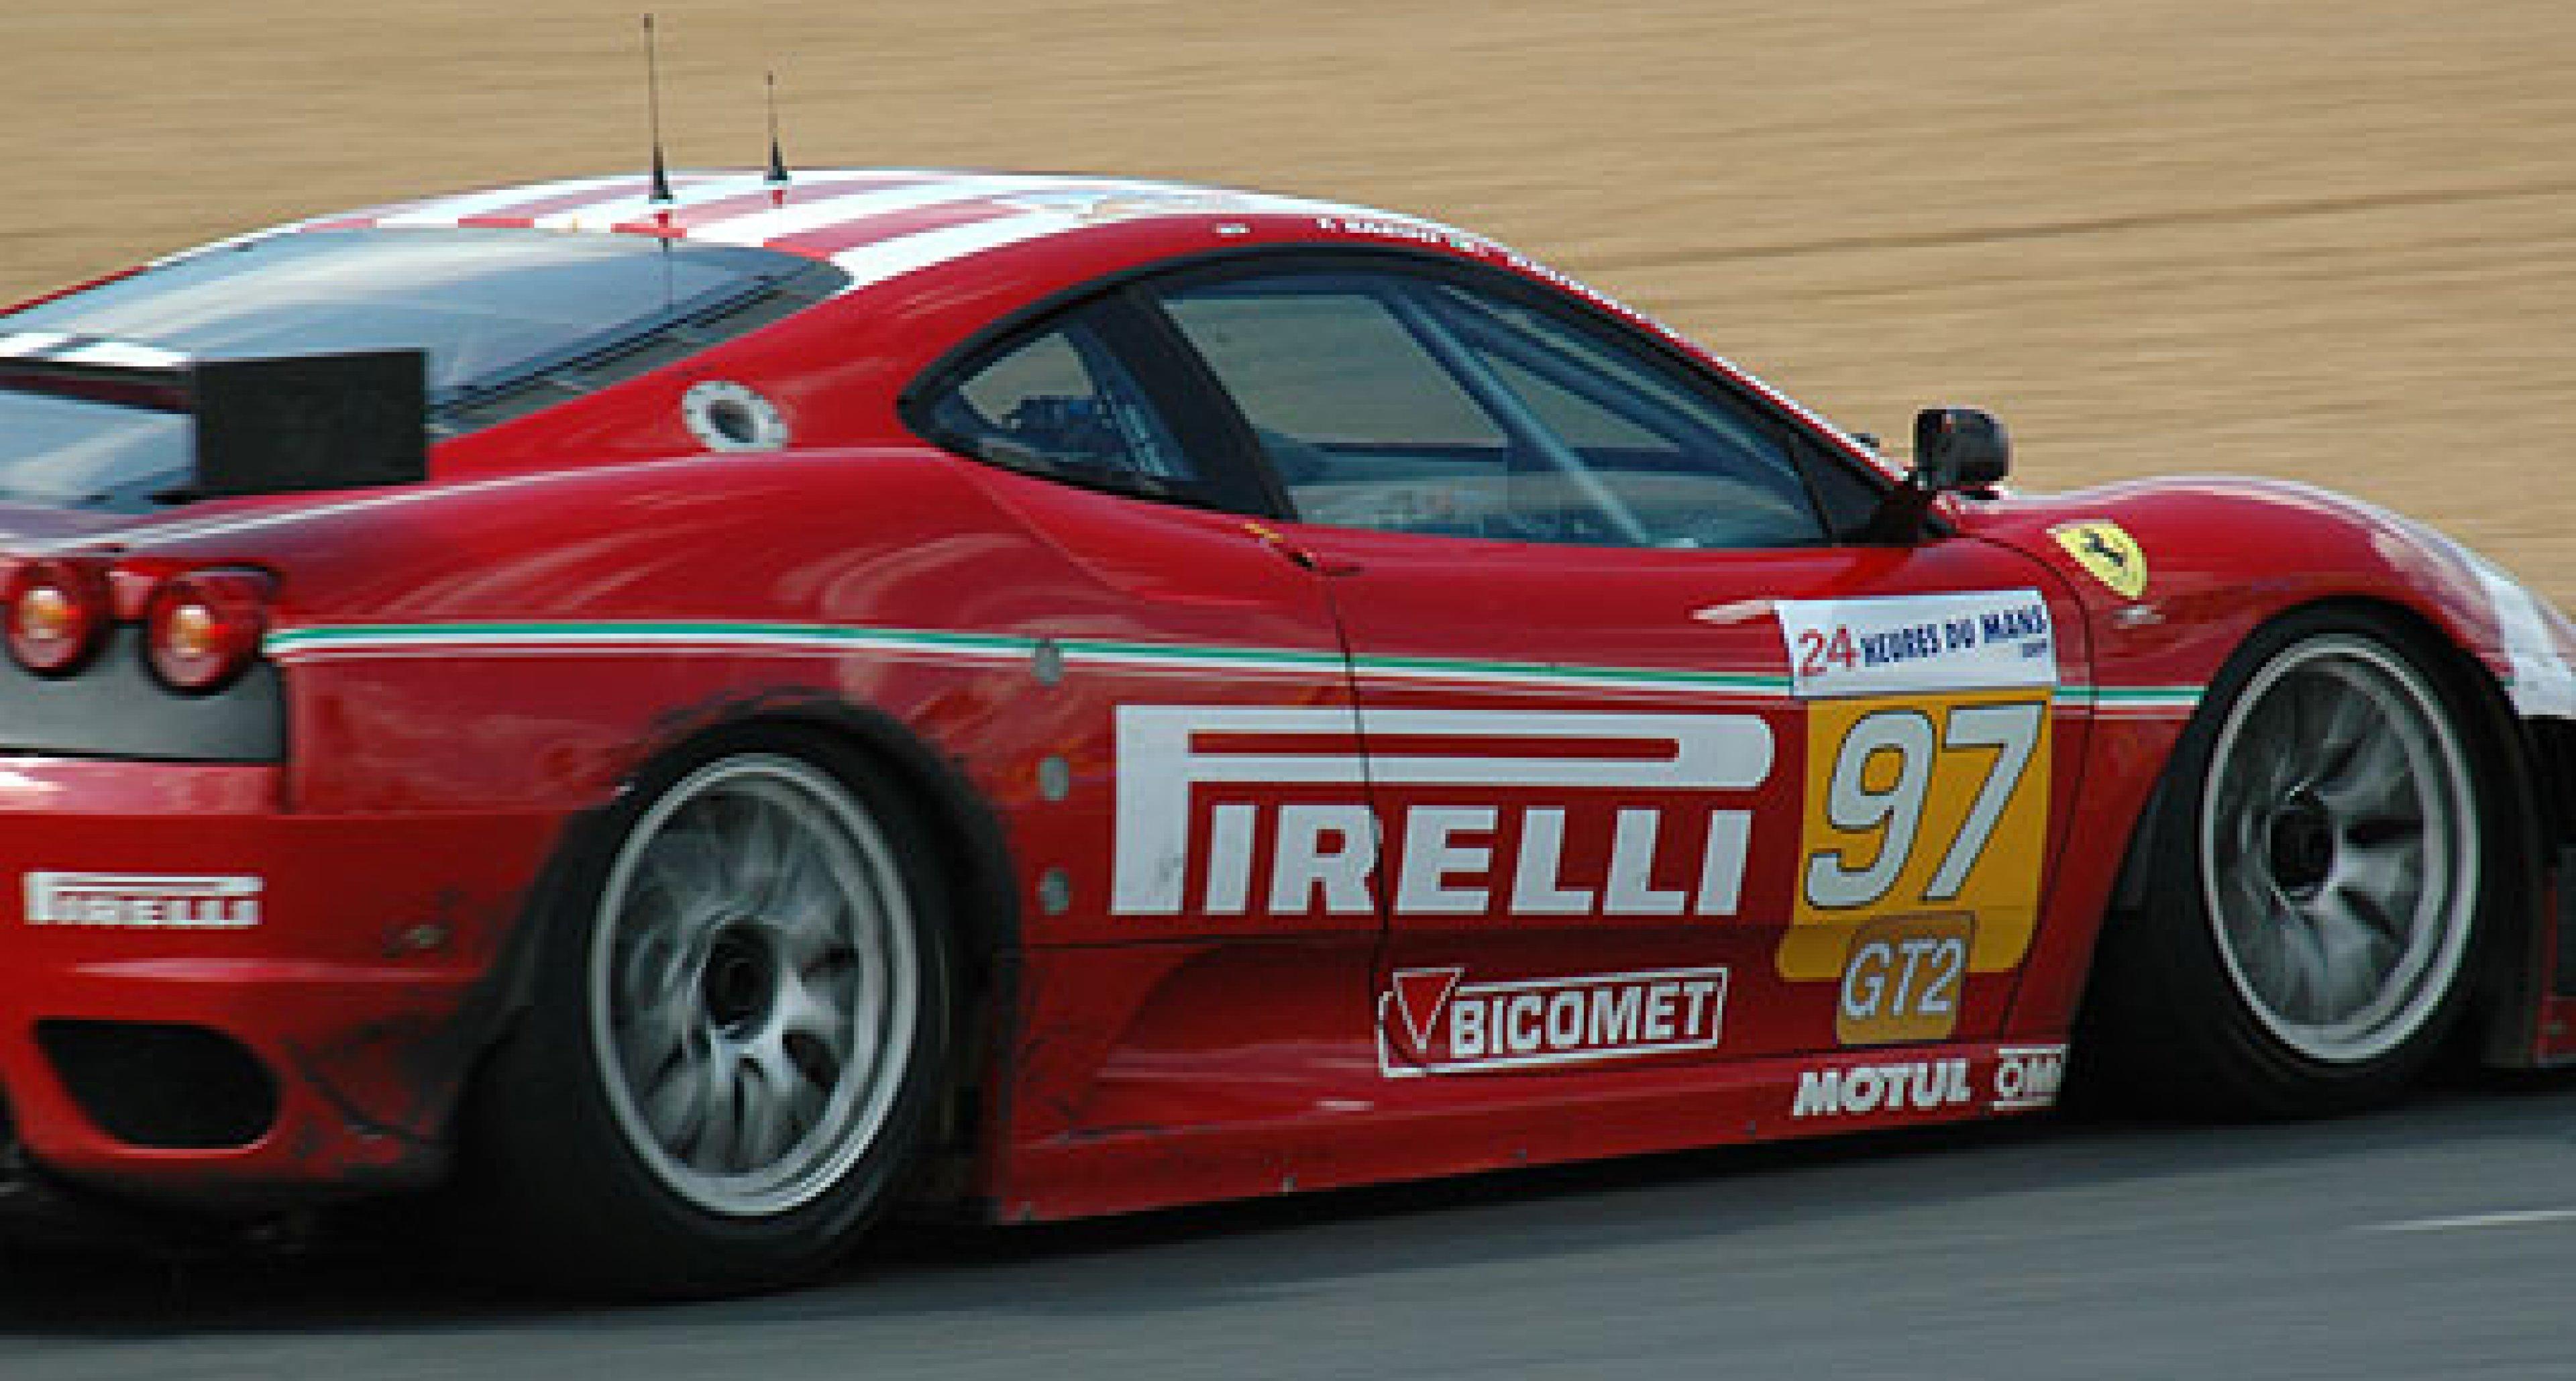 The 2009 Le Mans 24 Hours